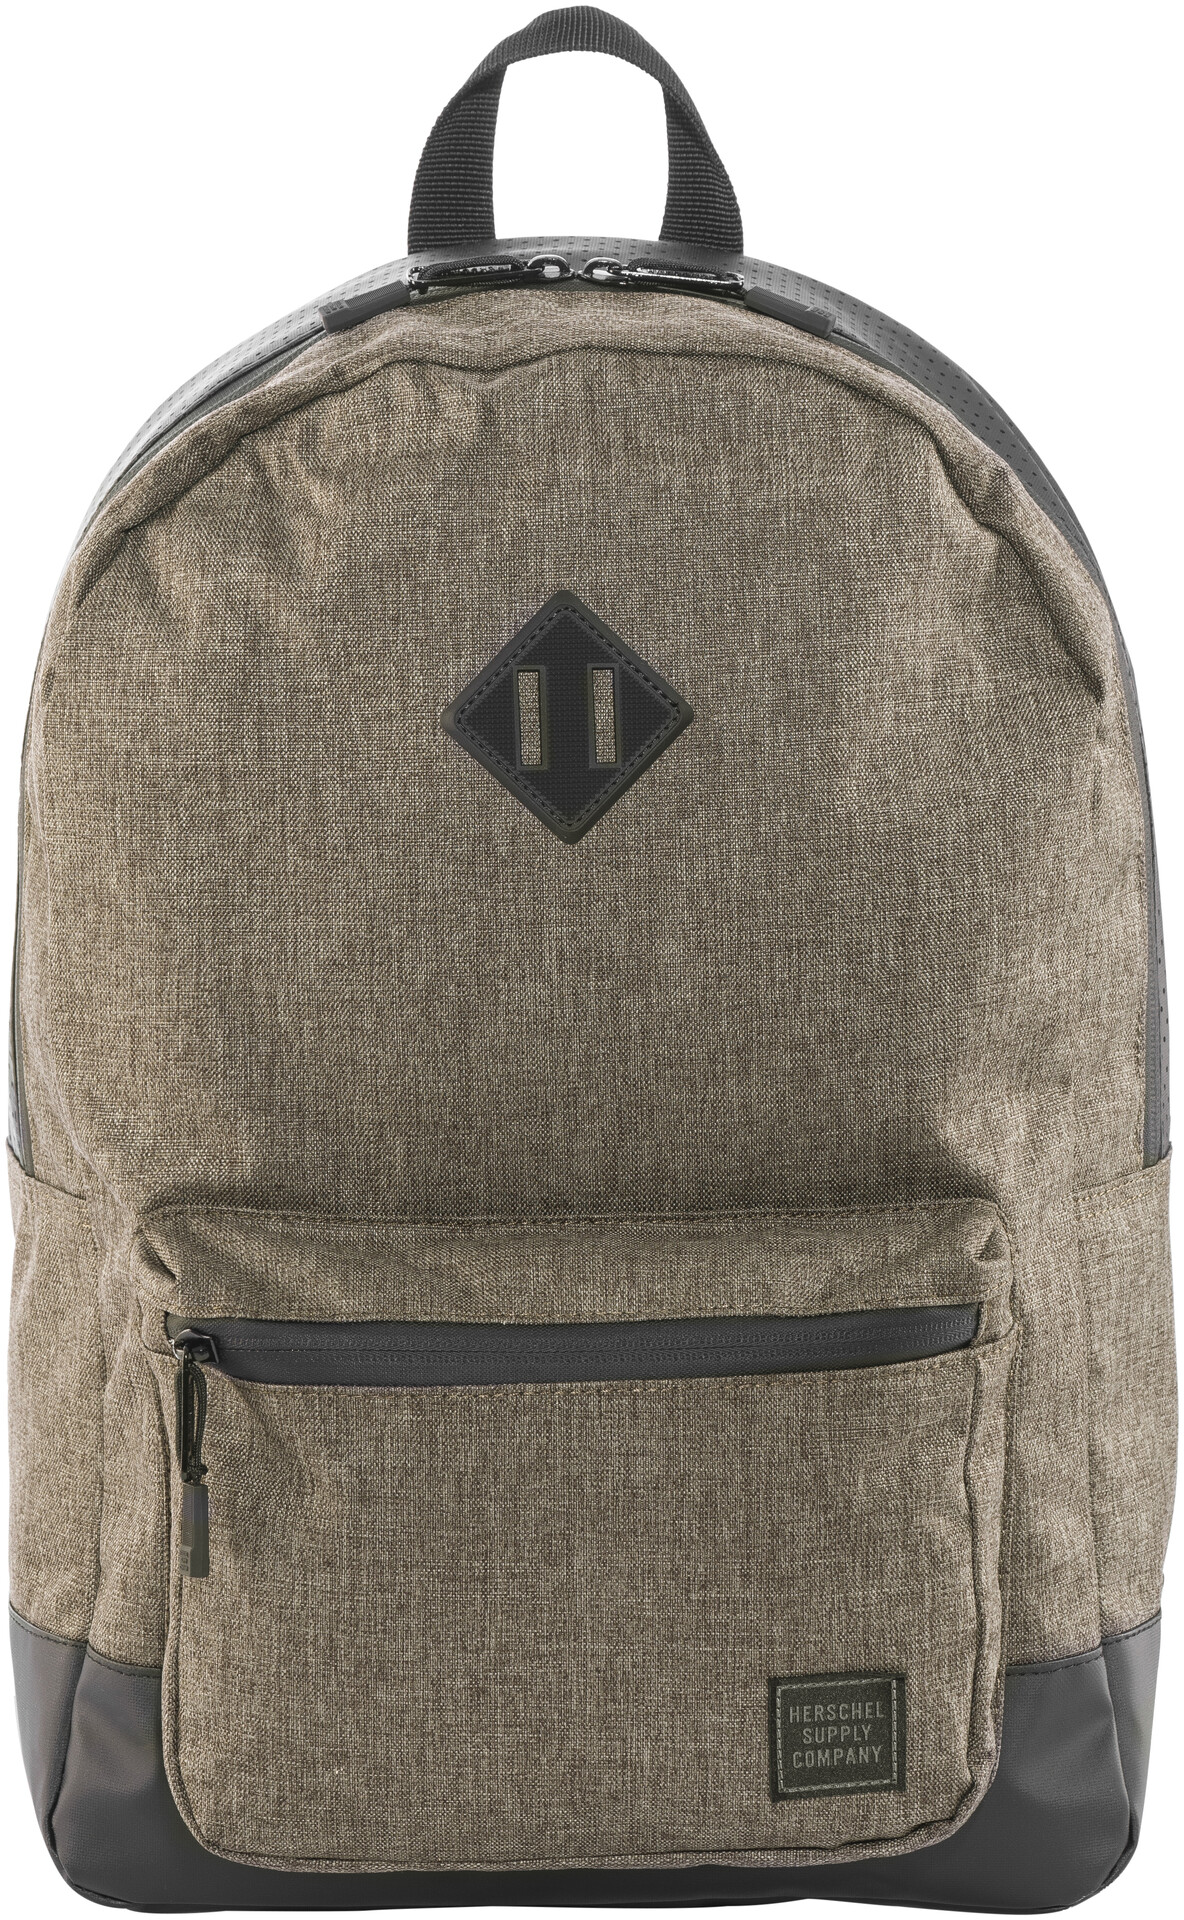 Herschel Ruskin Backpack canteen crosshatchblack